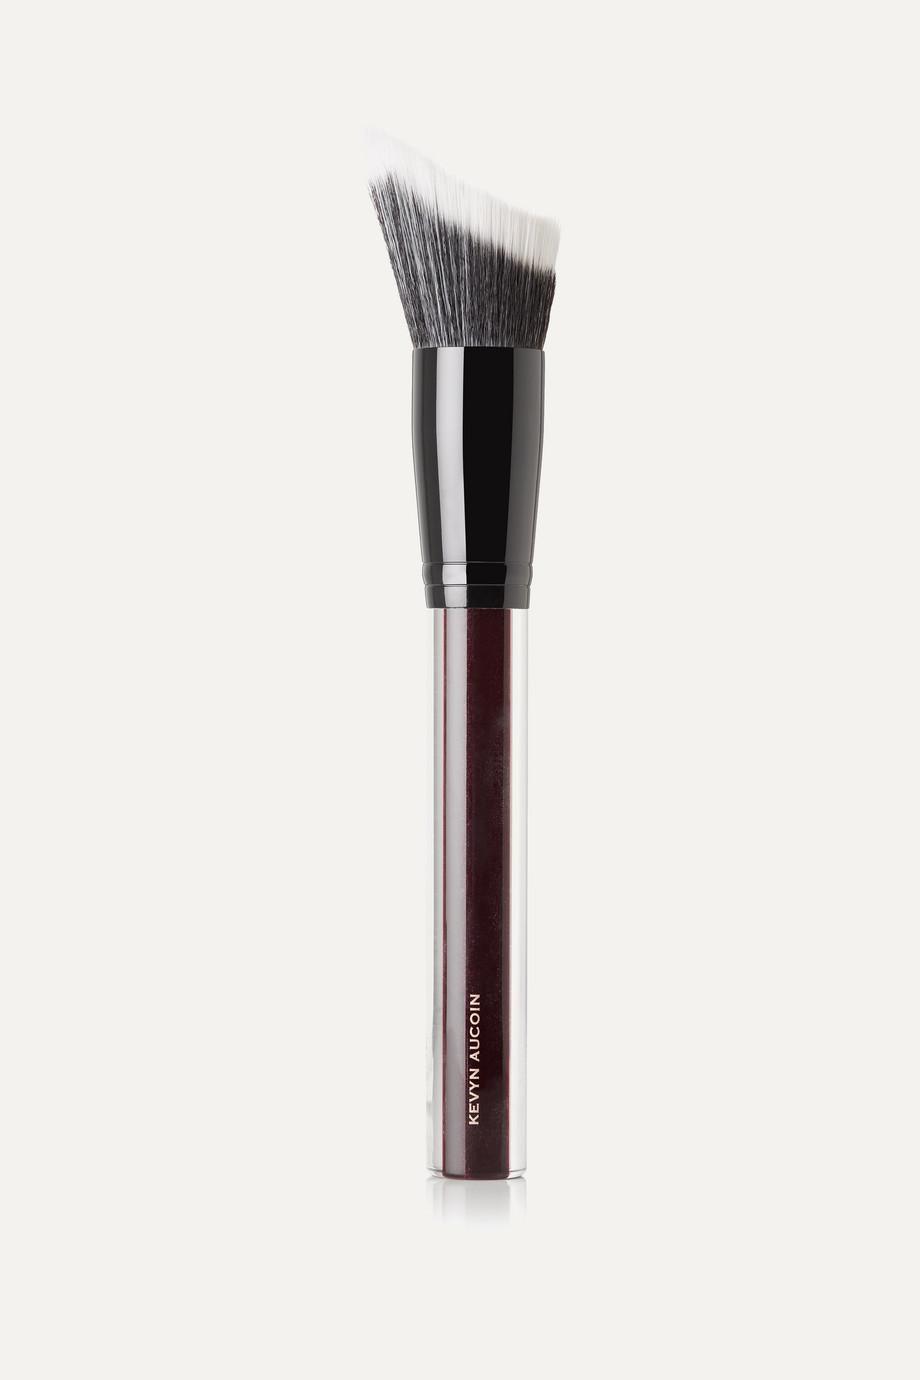 Kevyn Aucoin The Neo-Powder Brush – Pinsel